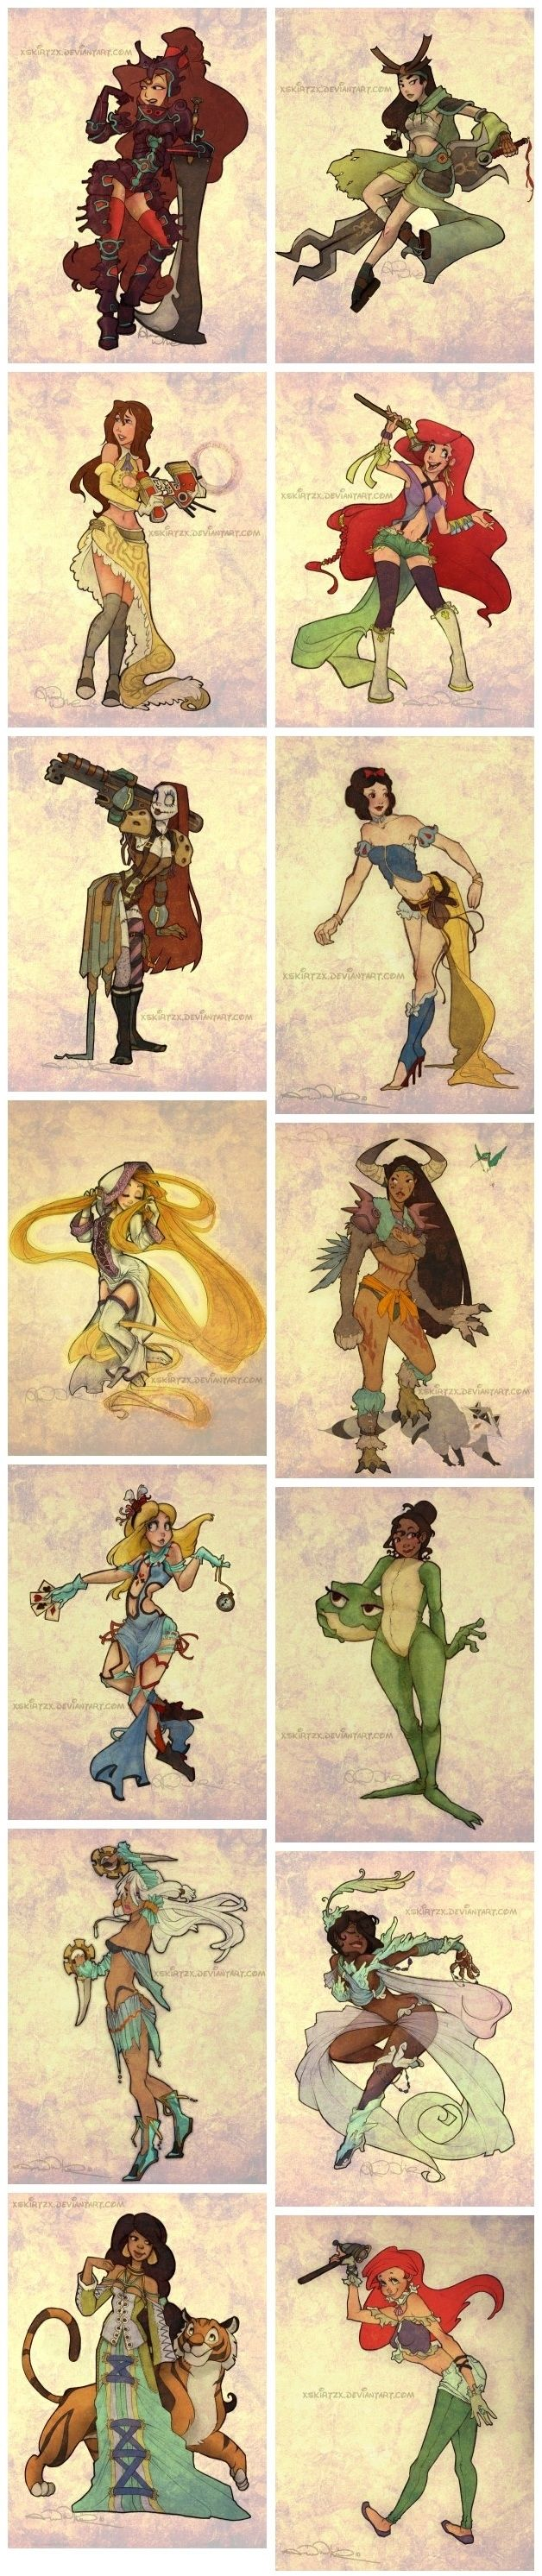 Final Fantasy Style Disney Princesses. I'm pretty sure its specifically Final Fantasy X-2.